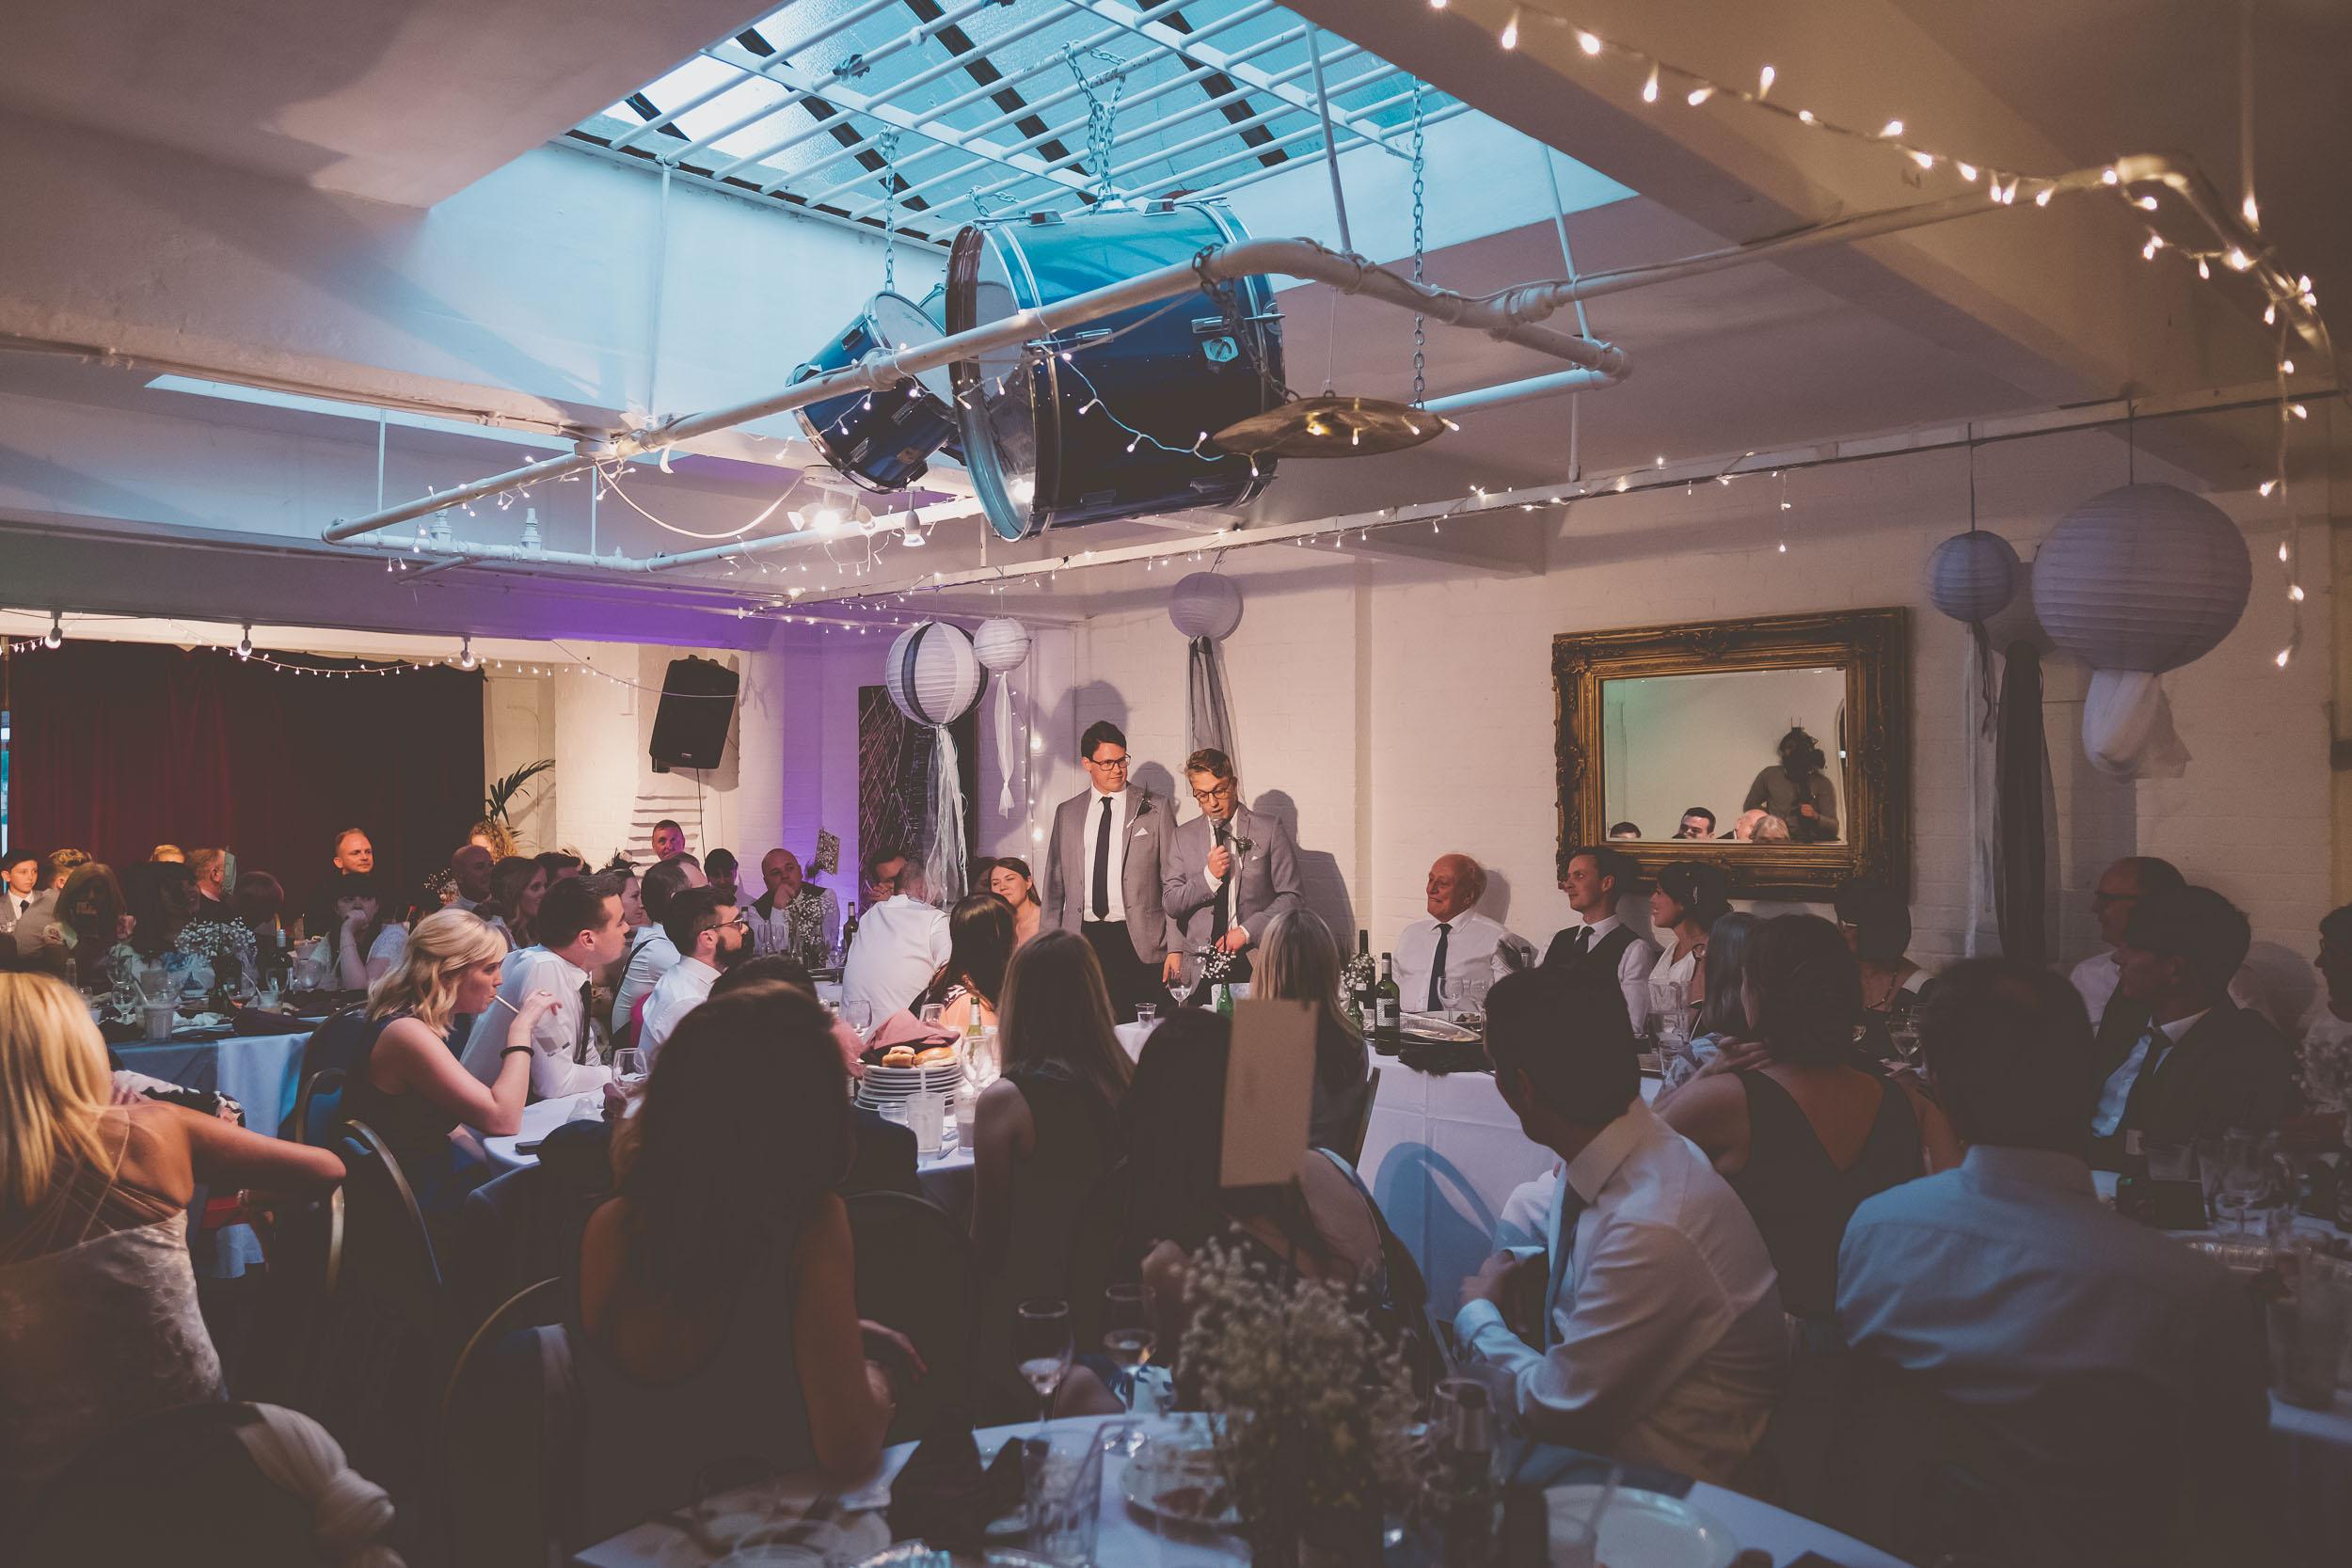 islington-town-hall-4th-floor-studios-wedding395.jpg